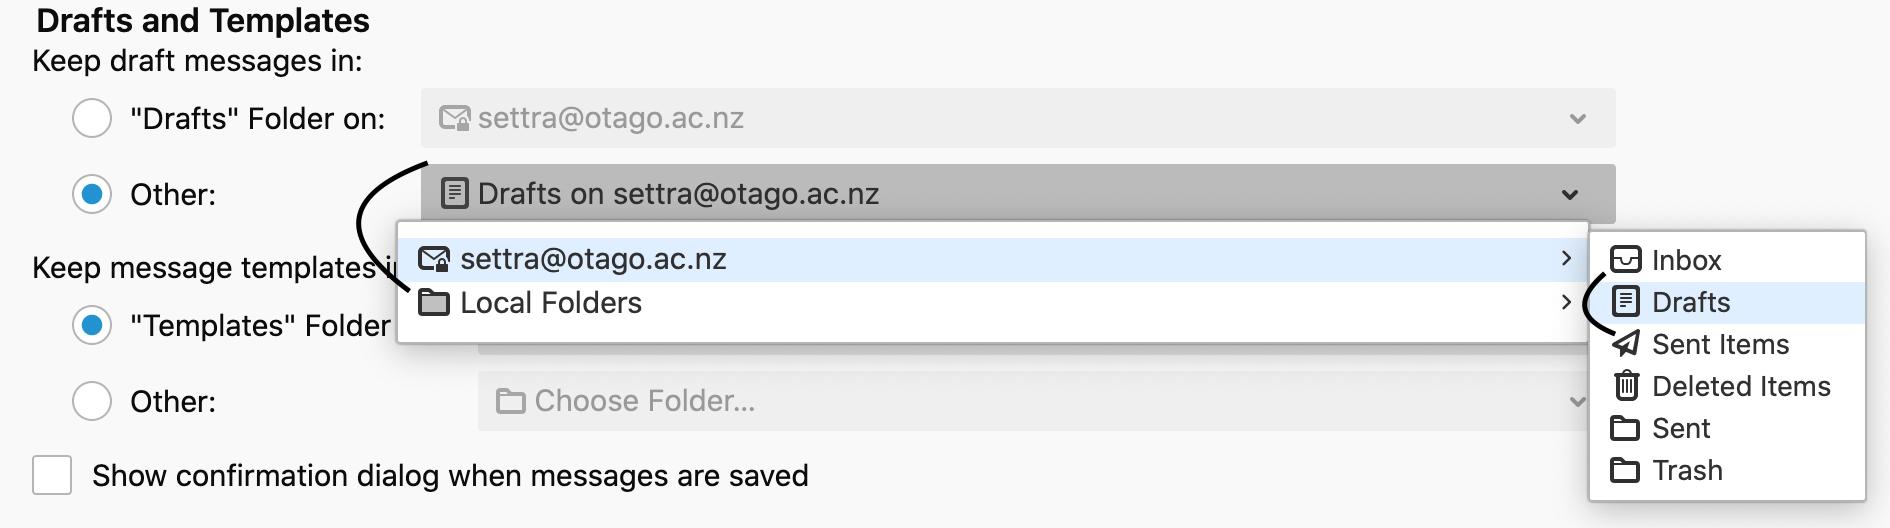 screenshot of step 8 Copies & Folders tab in Microsoft 365 - draft messages